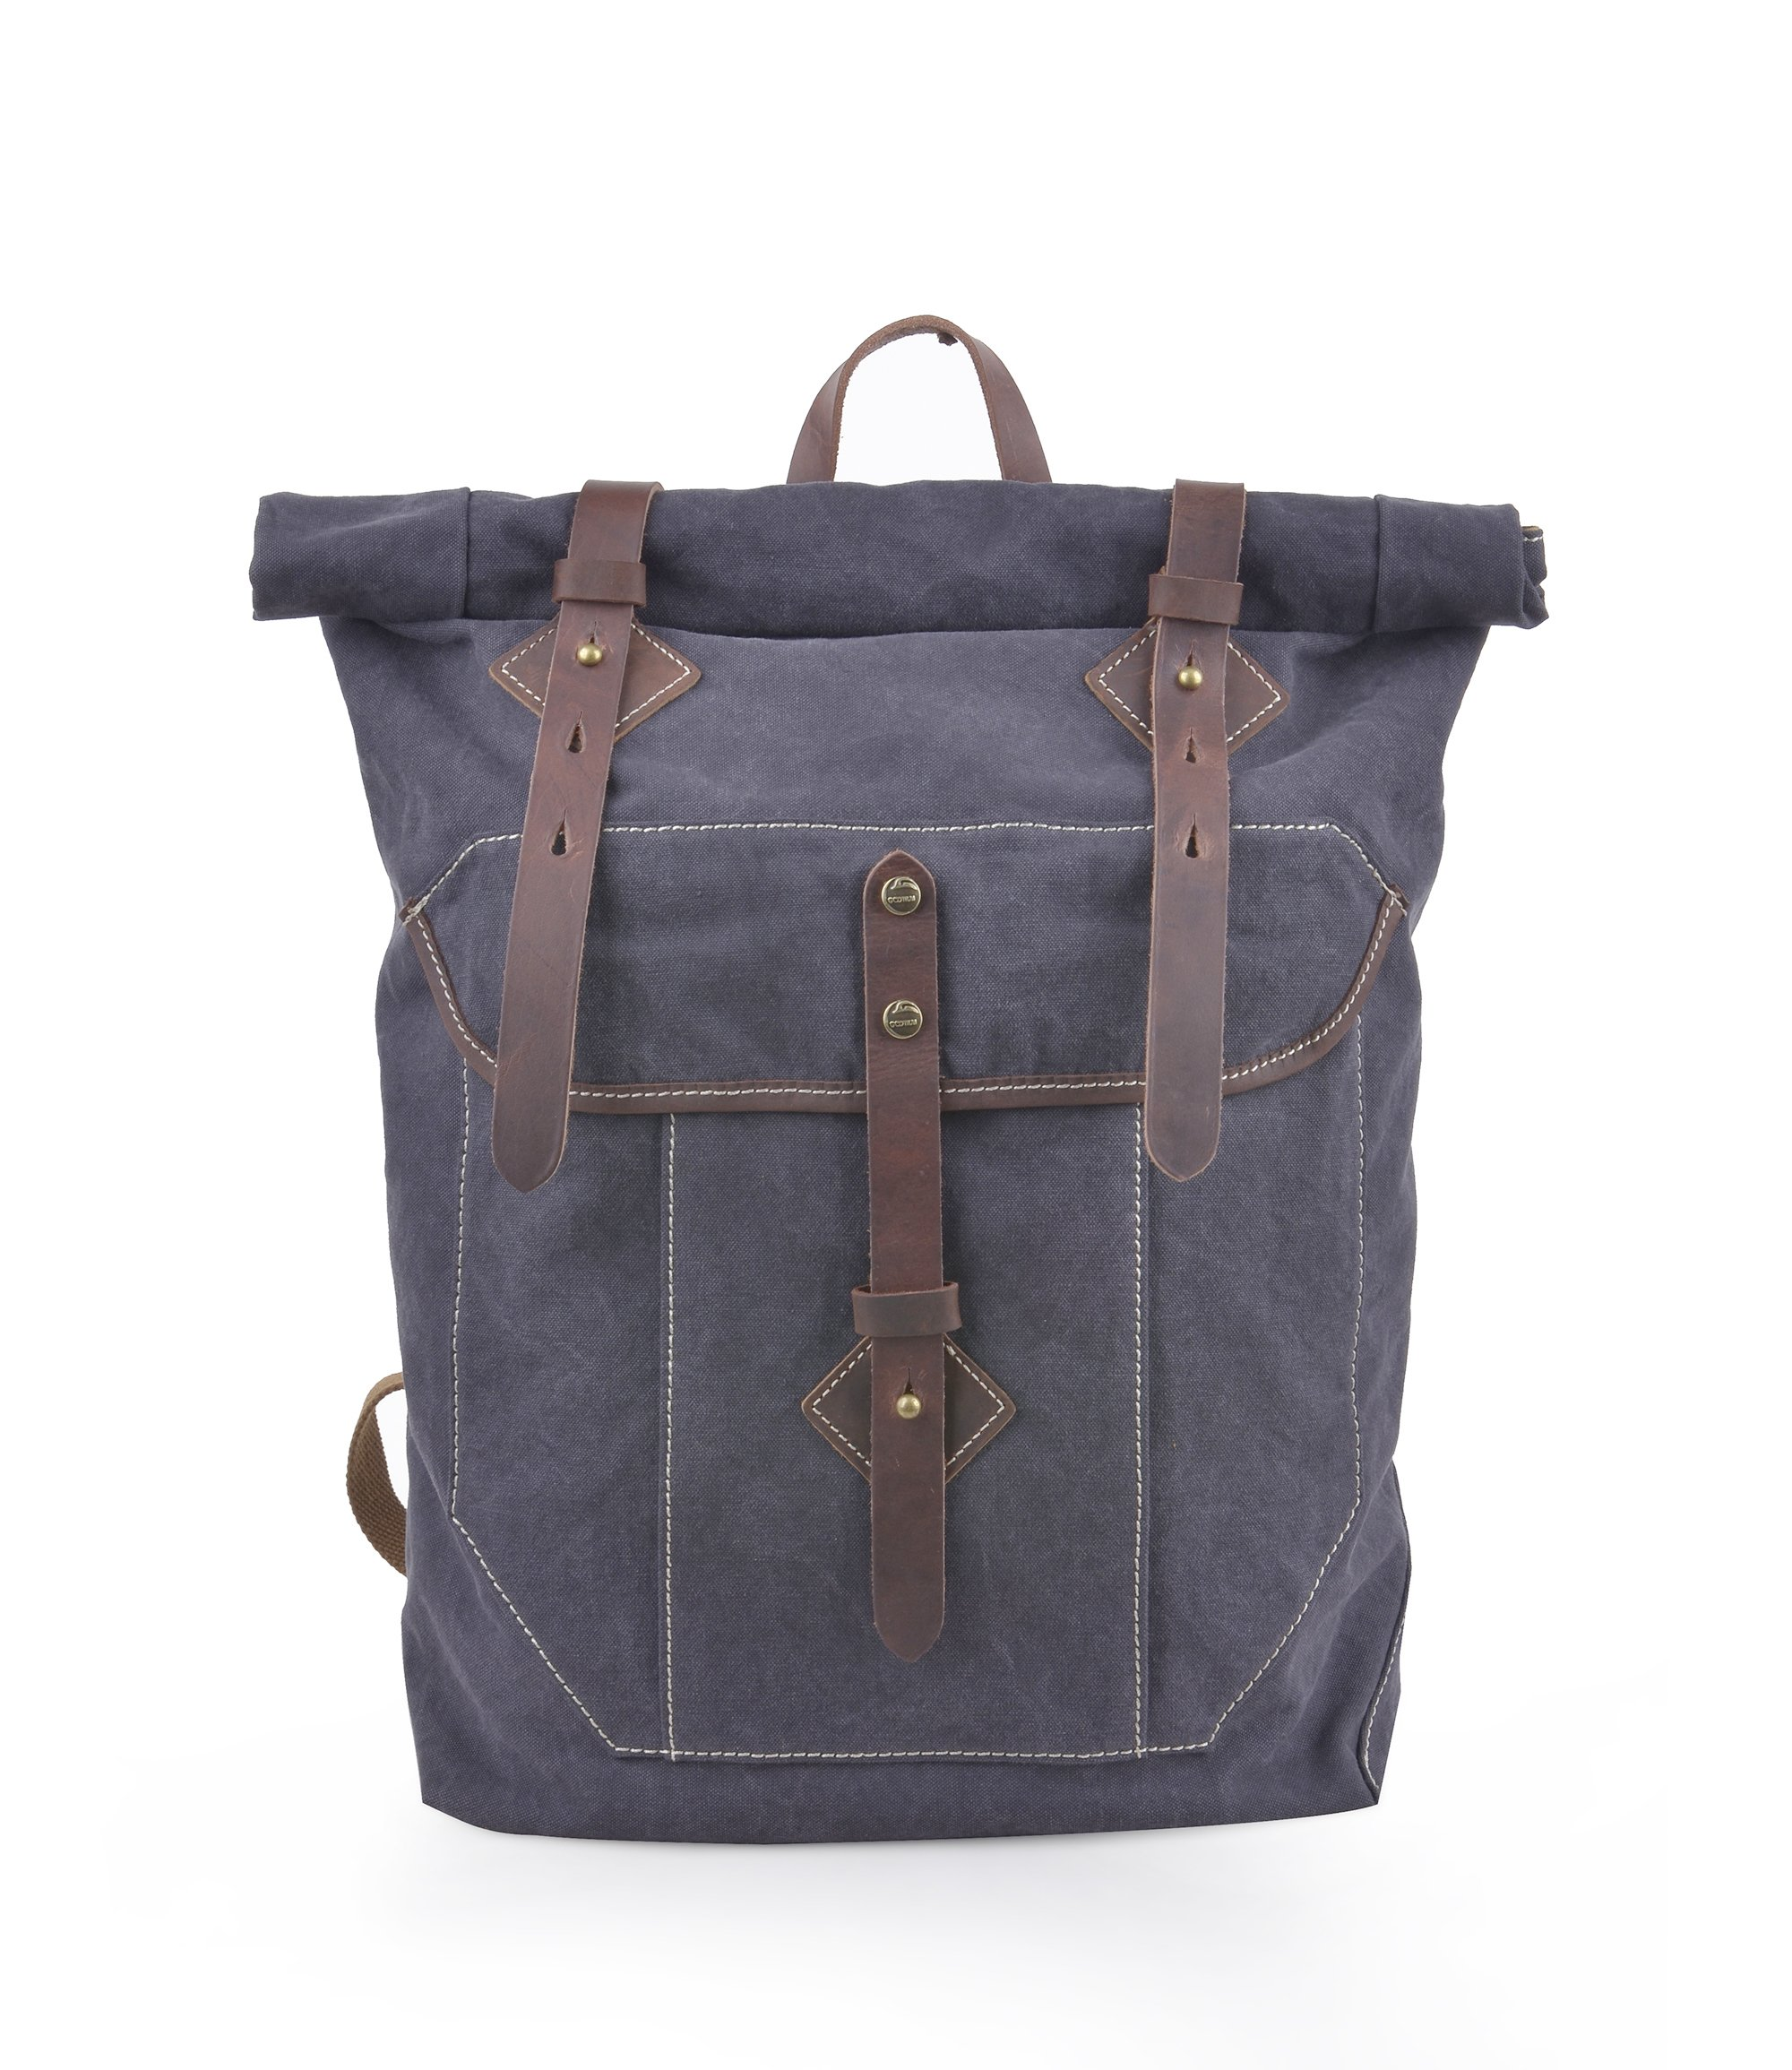 Gootium Vintage Canvas Backpack - Unisex Roll-top Rucksack, Darkish Blue